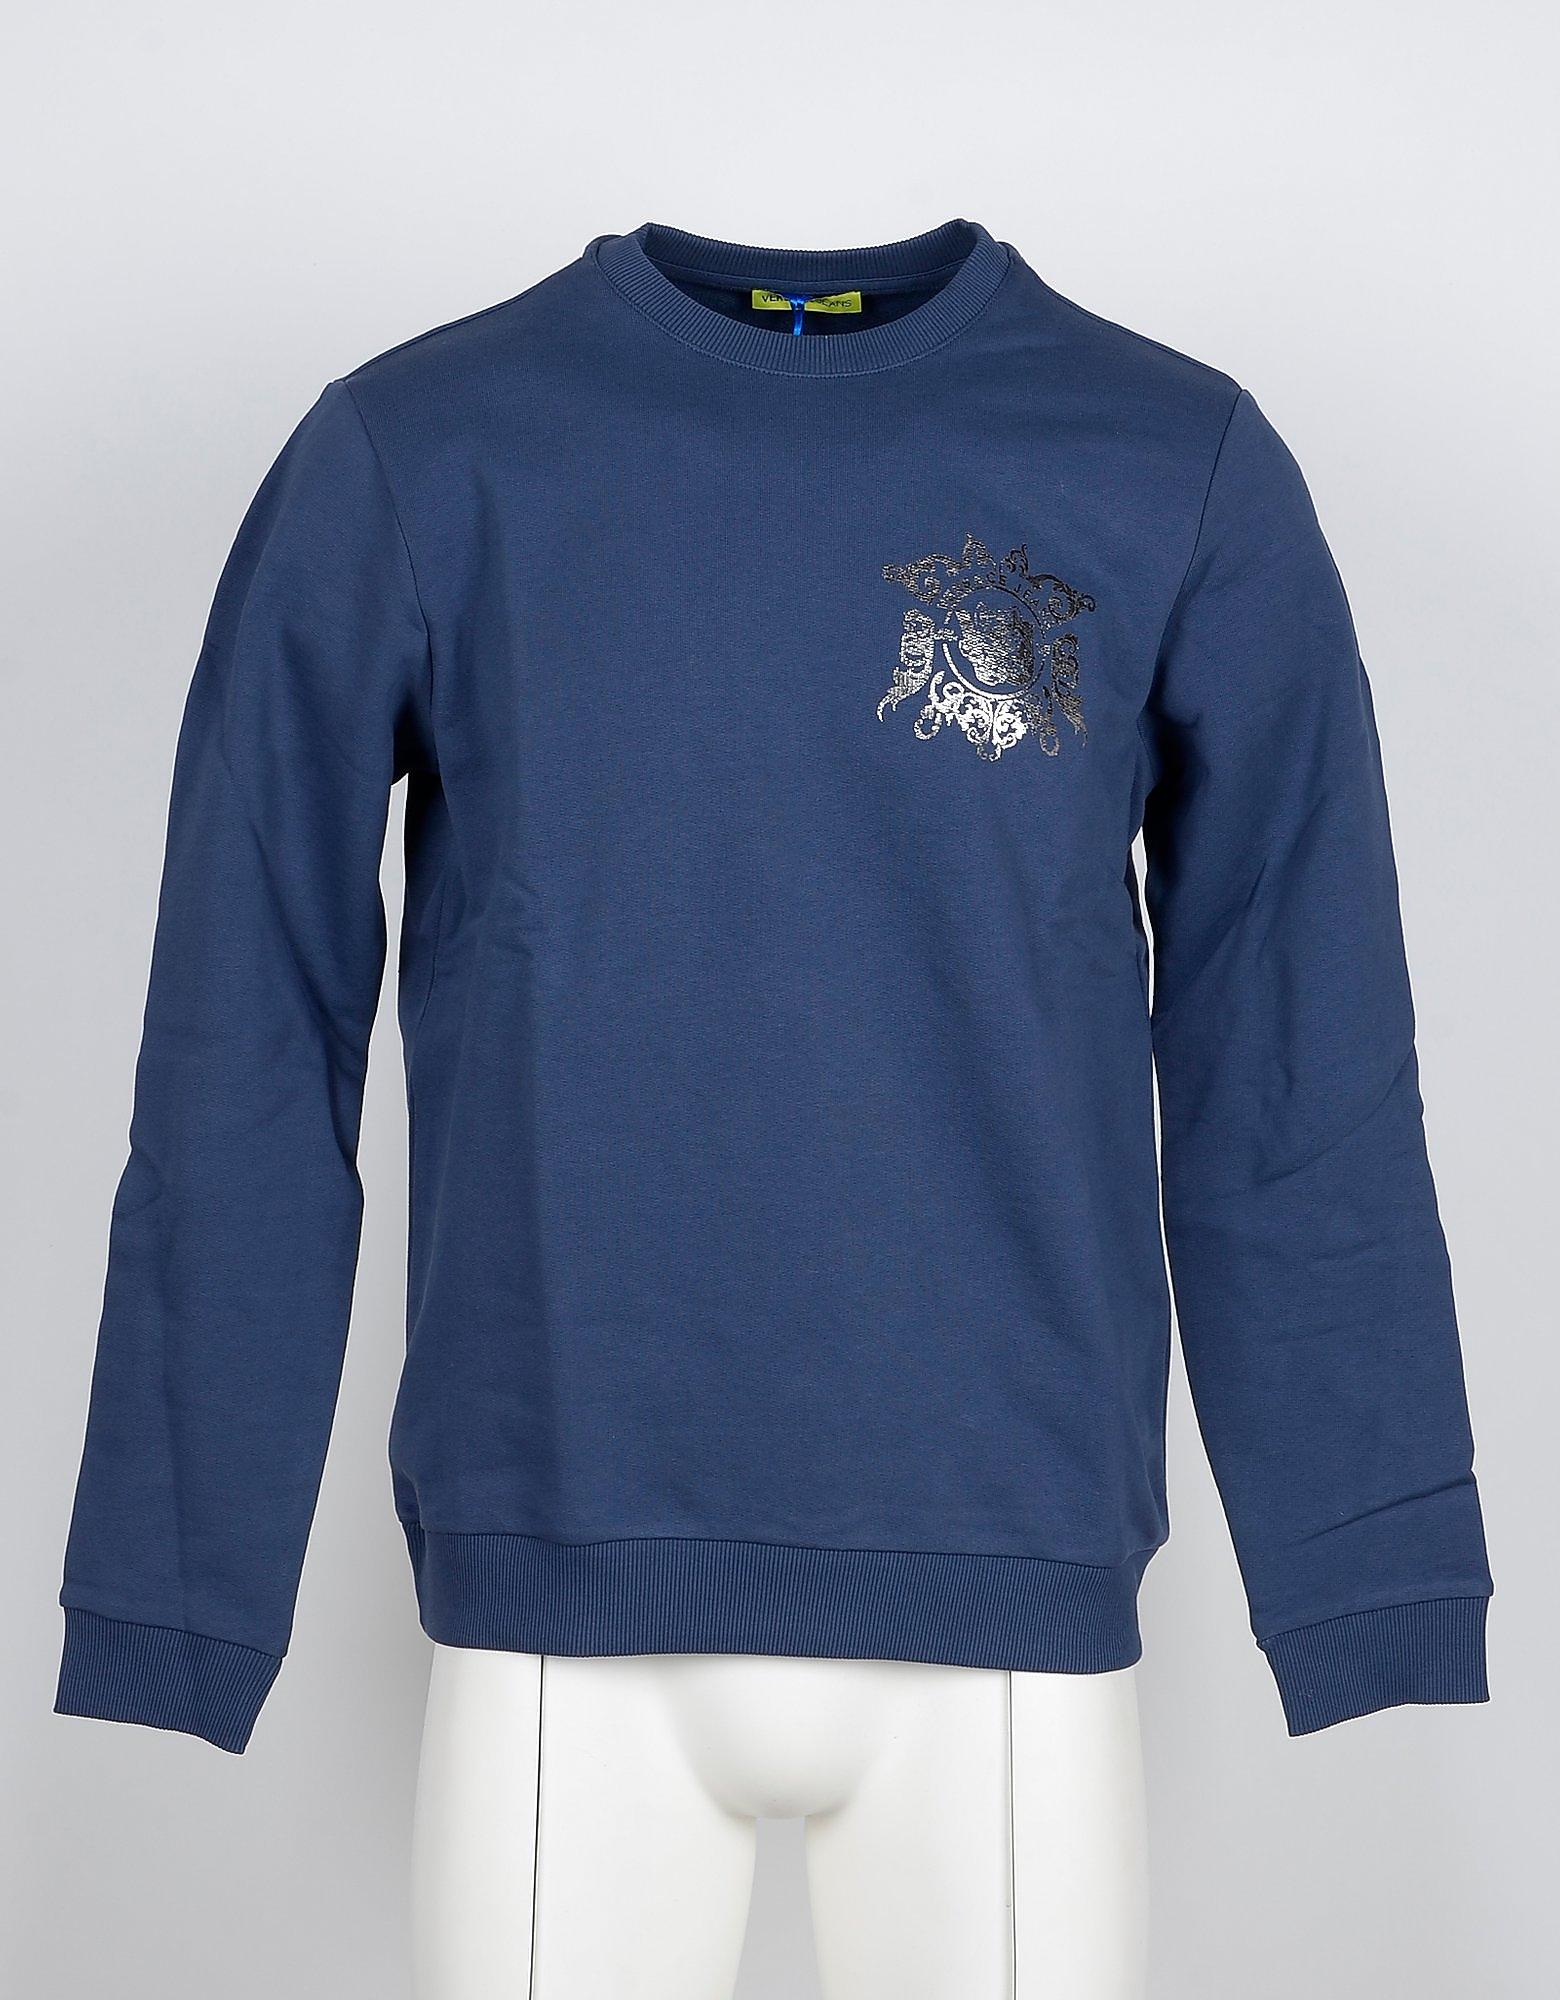 Versace Jeans Designer Sweatshirts, Blue Cotton Signature Men's Sweatshirt